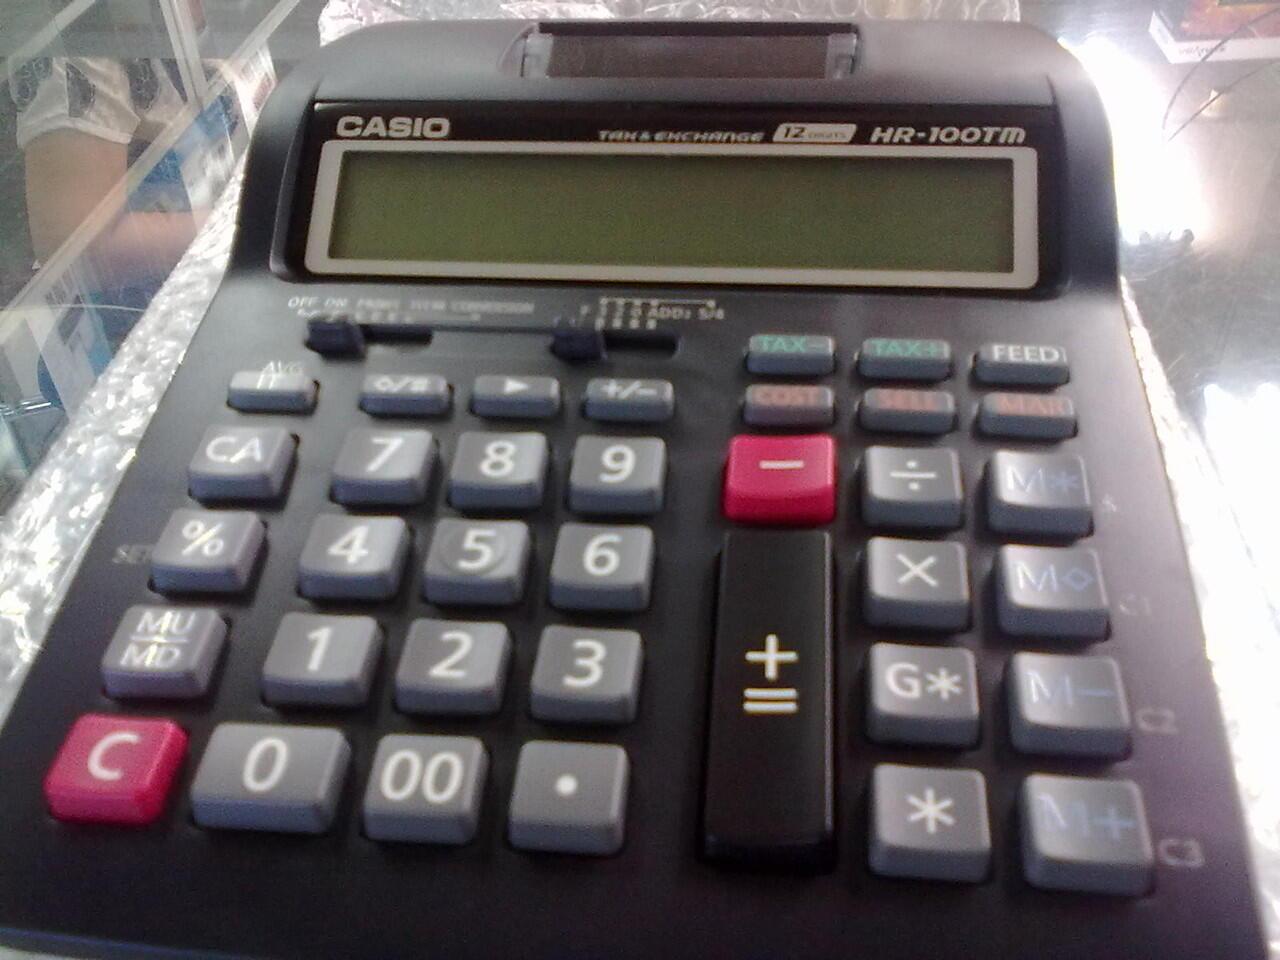 Casio Kalkulator Printer Dr 240tm Putih. Cajas Registradoras Multipapel